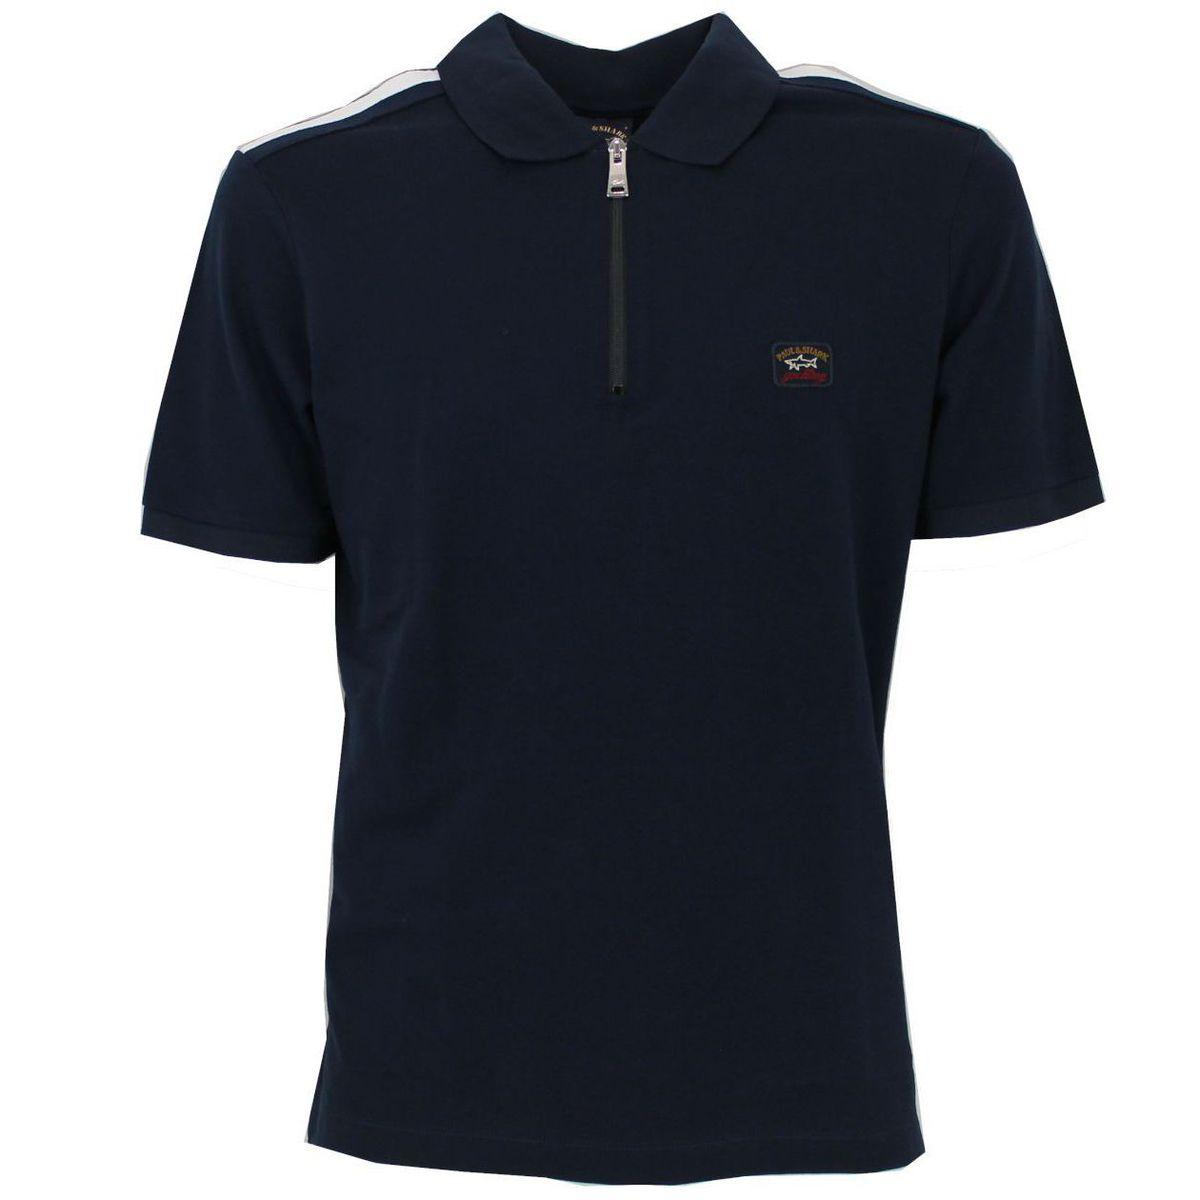 Polo in cotone pique con colletto in contrasto Blue PAUL & SHARK